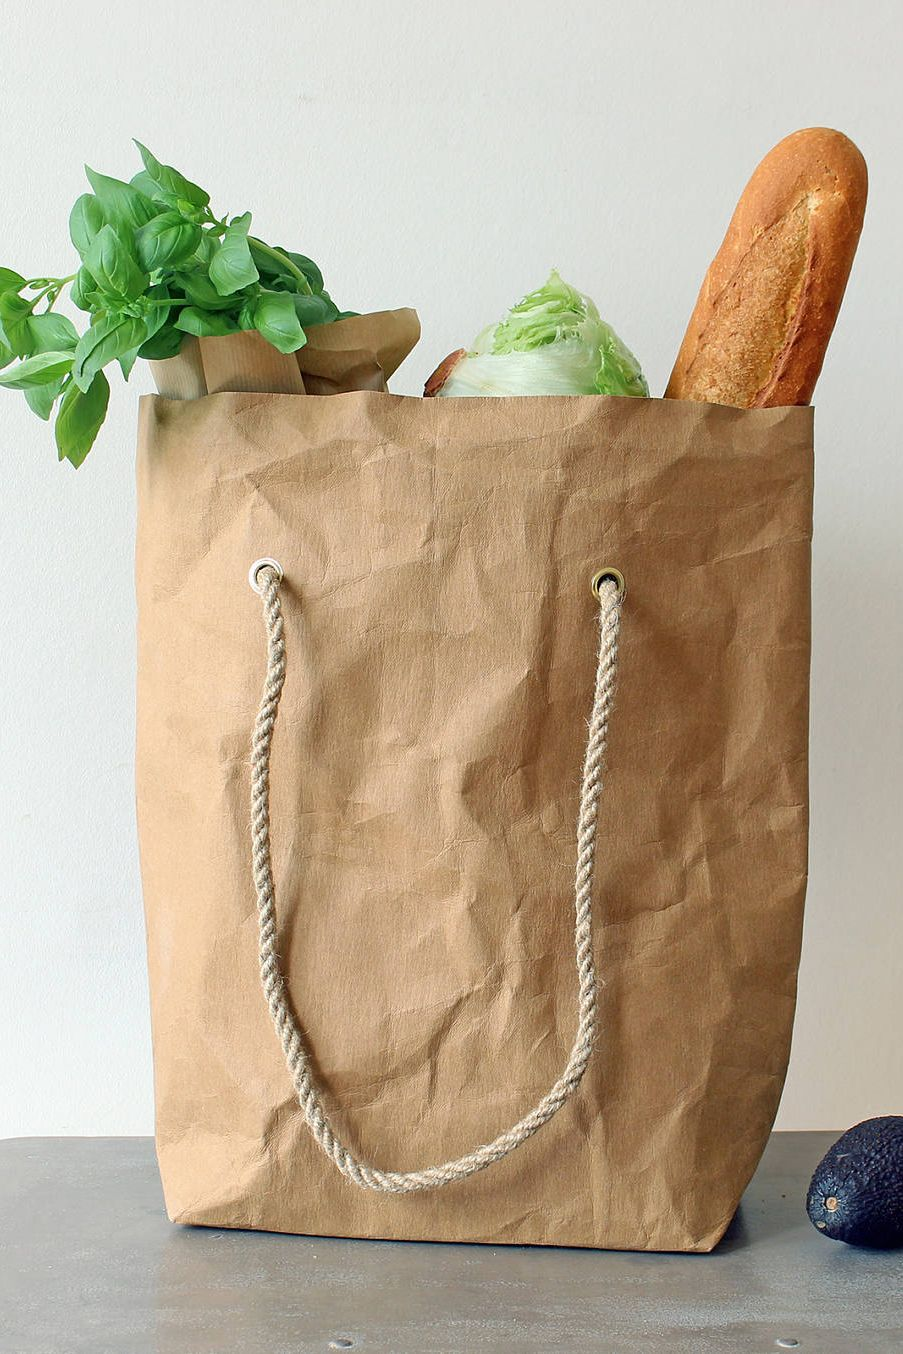 d1361cfa45a5 Grocery bag, Paper tote bag, washable paper bag, brown kraft paper ...